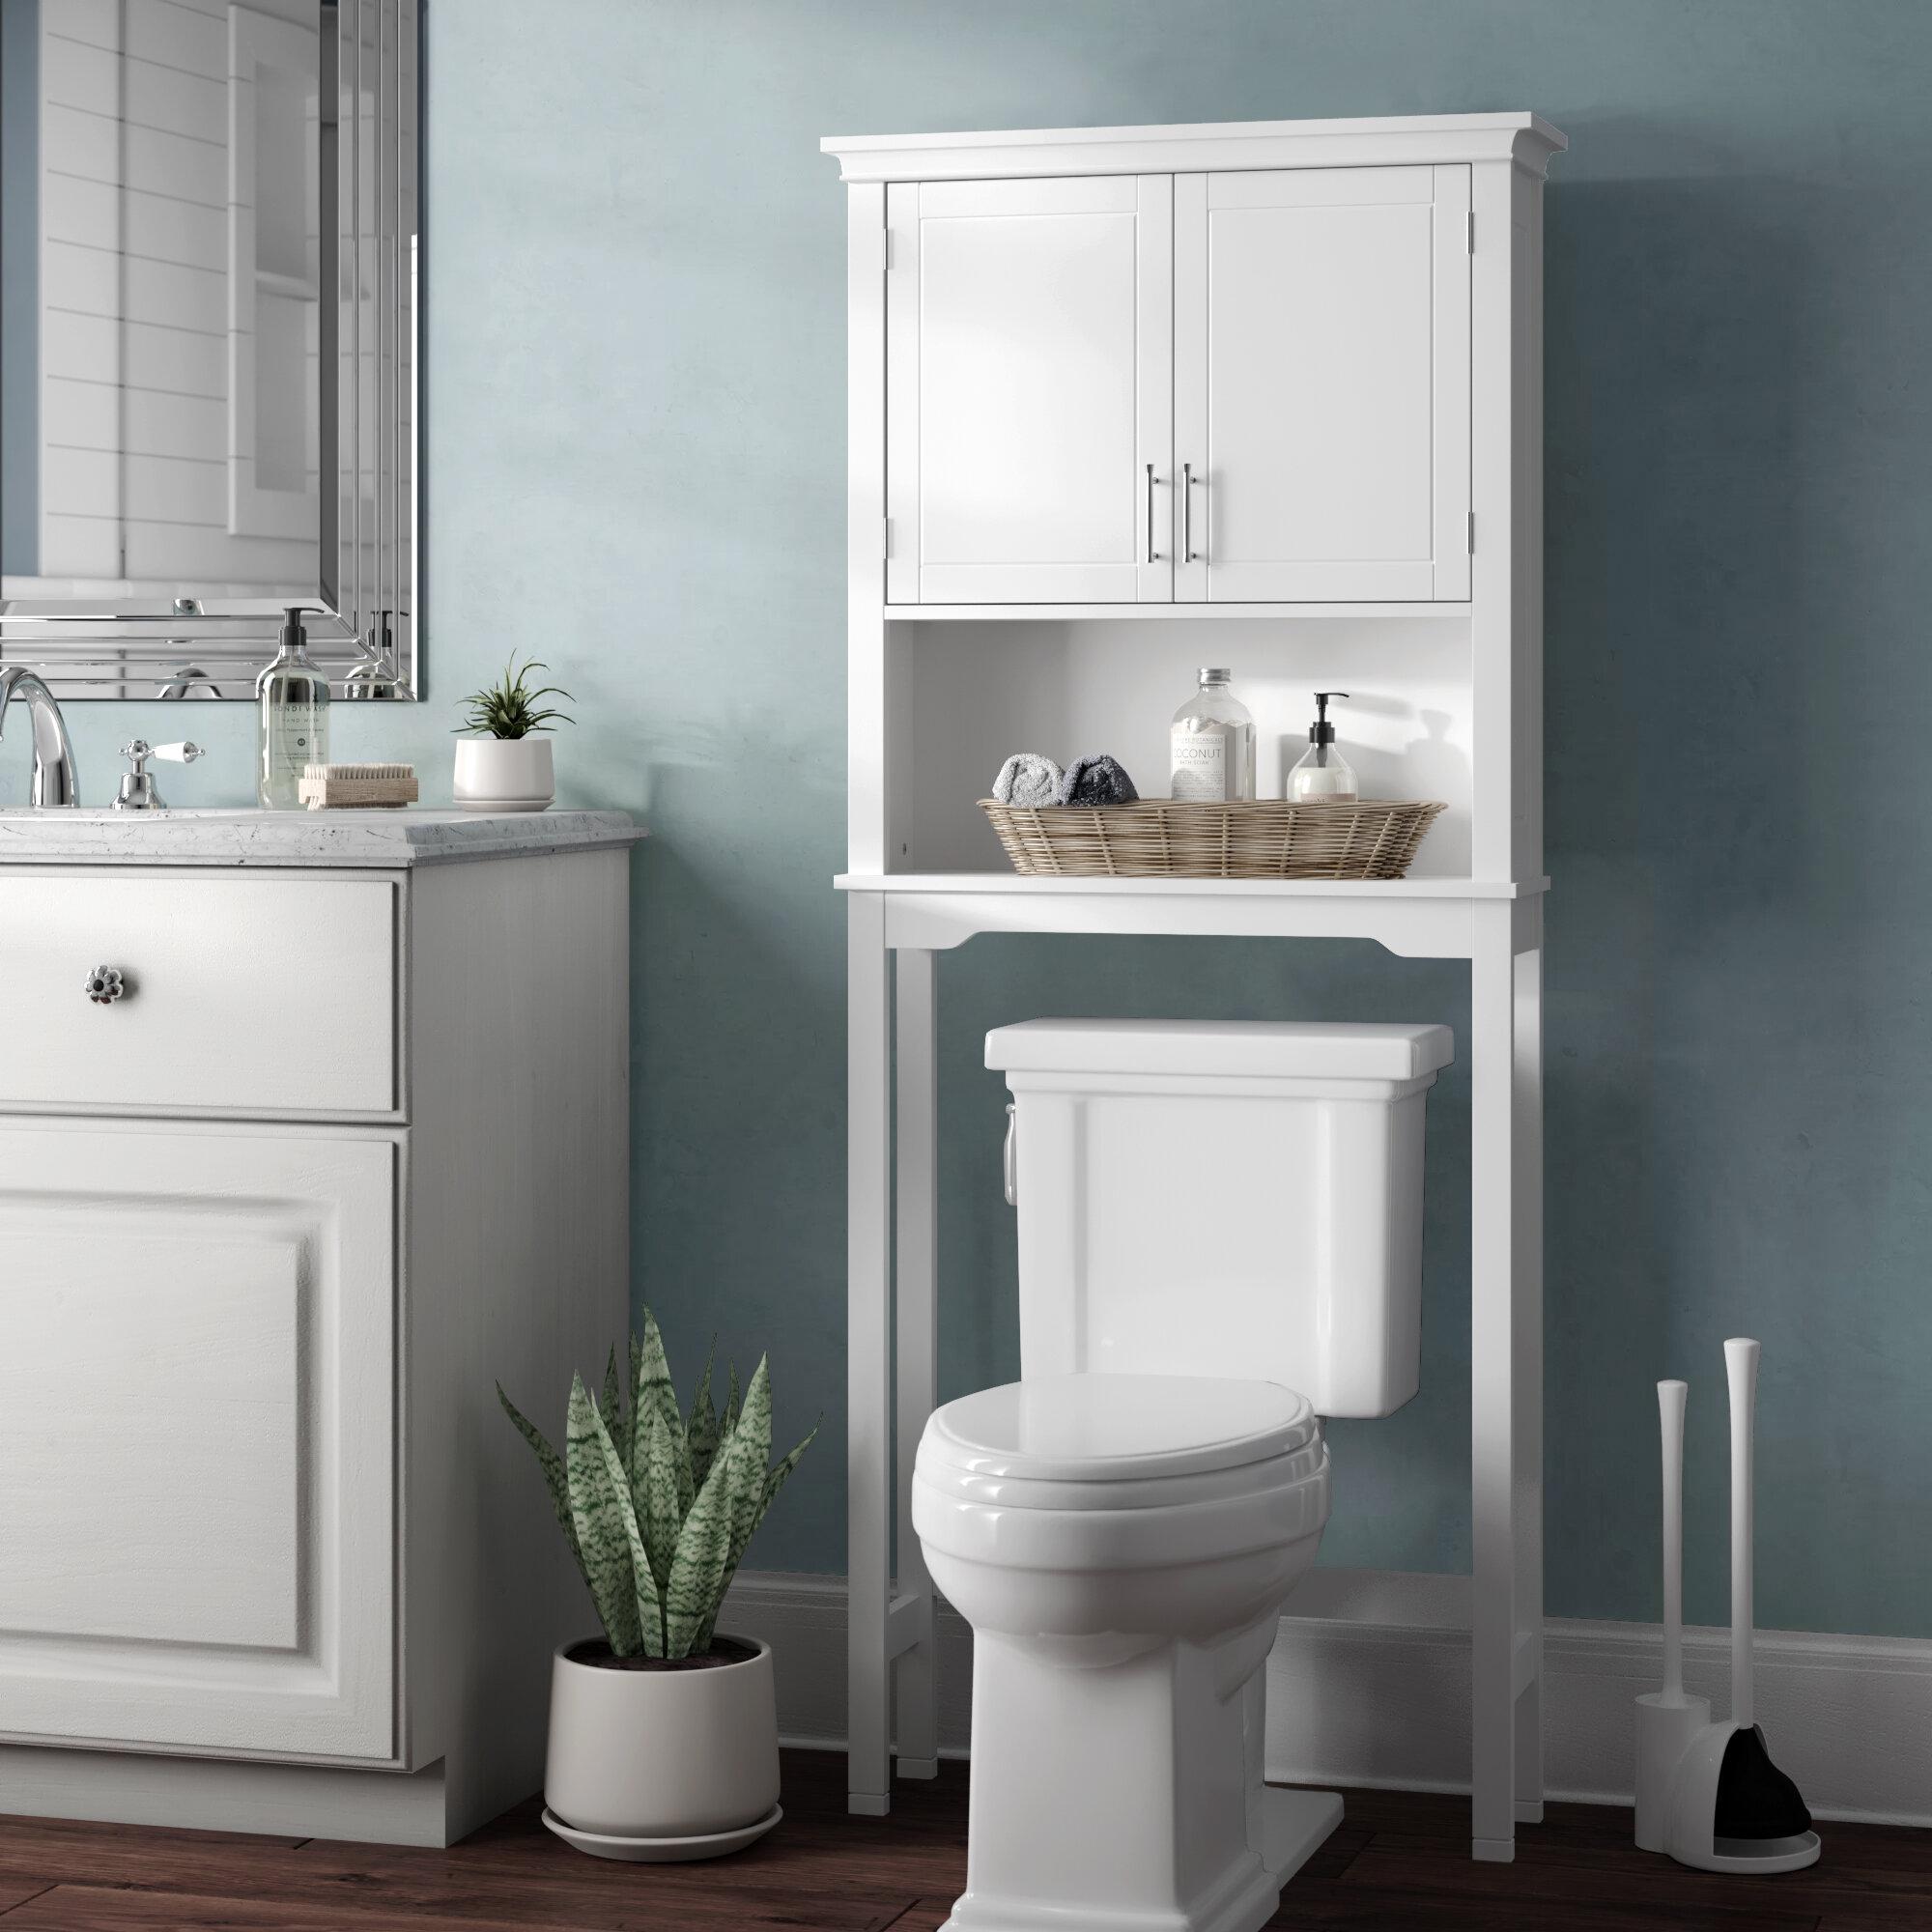 Merveilleux Over The Toilet Storage Cabinets | Wayfair